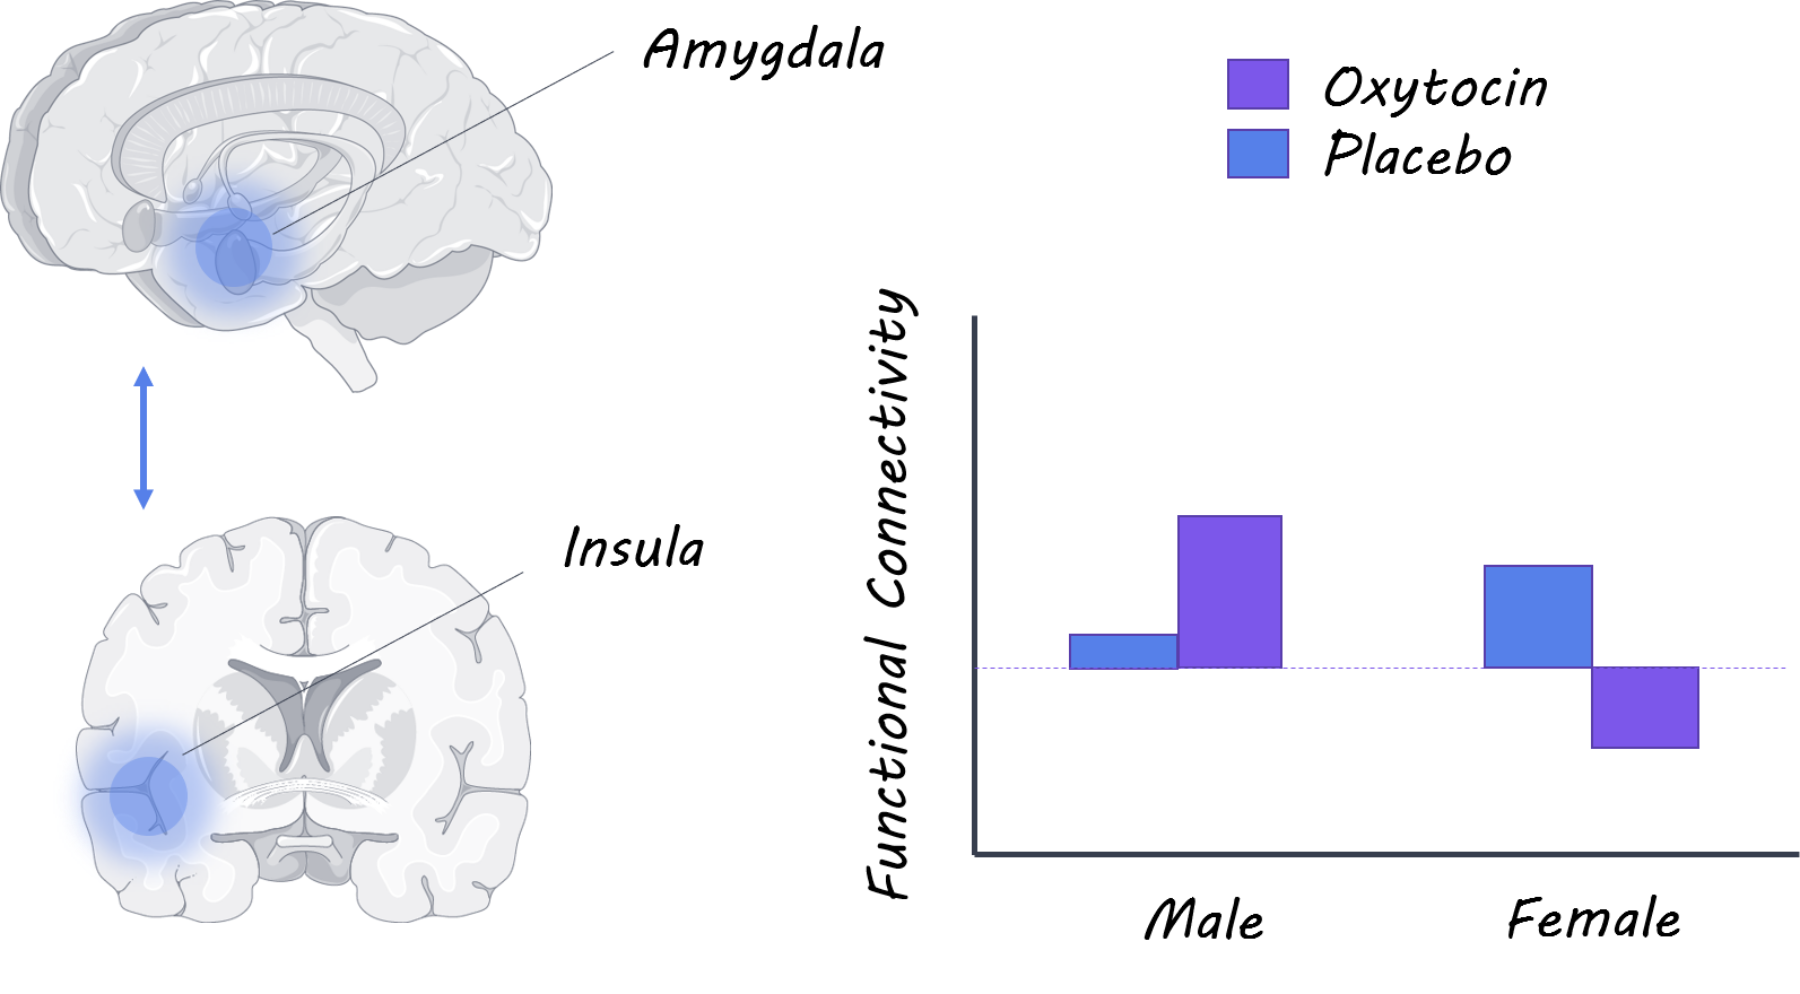 oxytocin1800.png